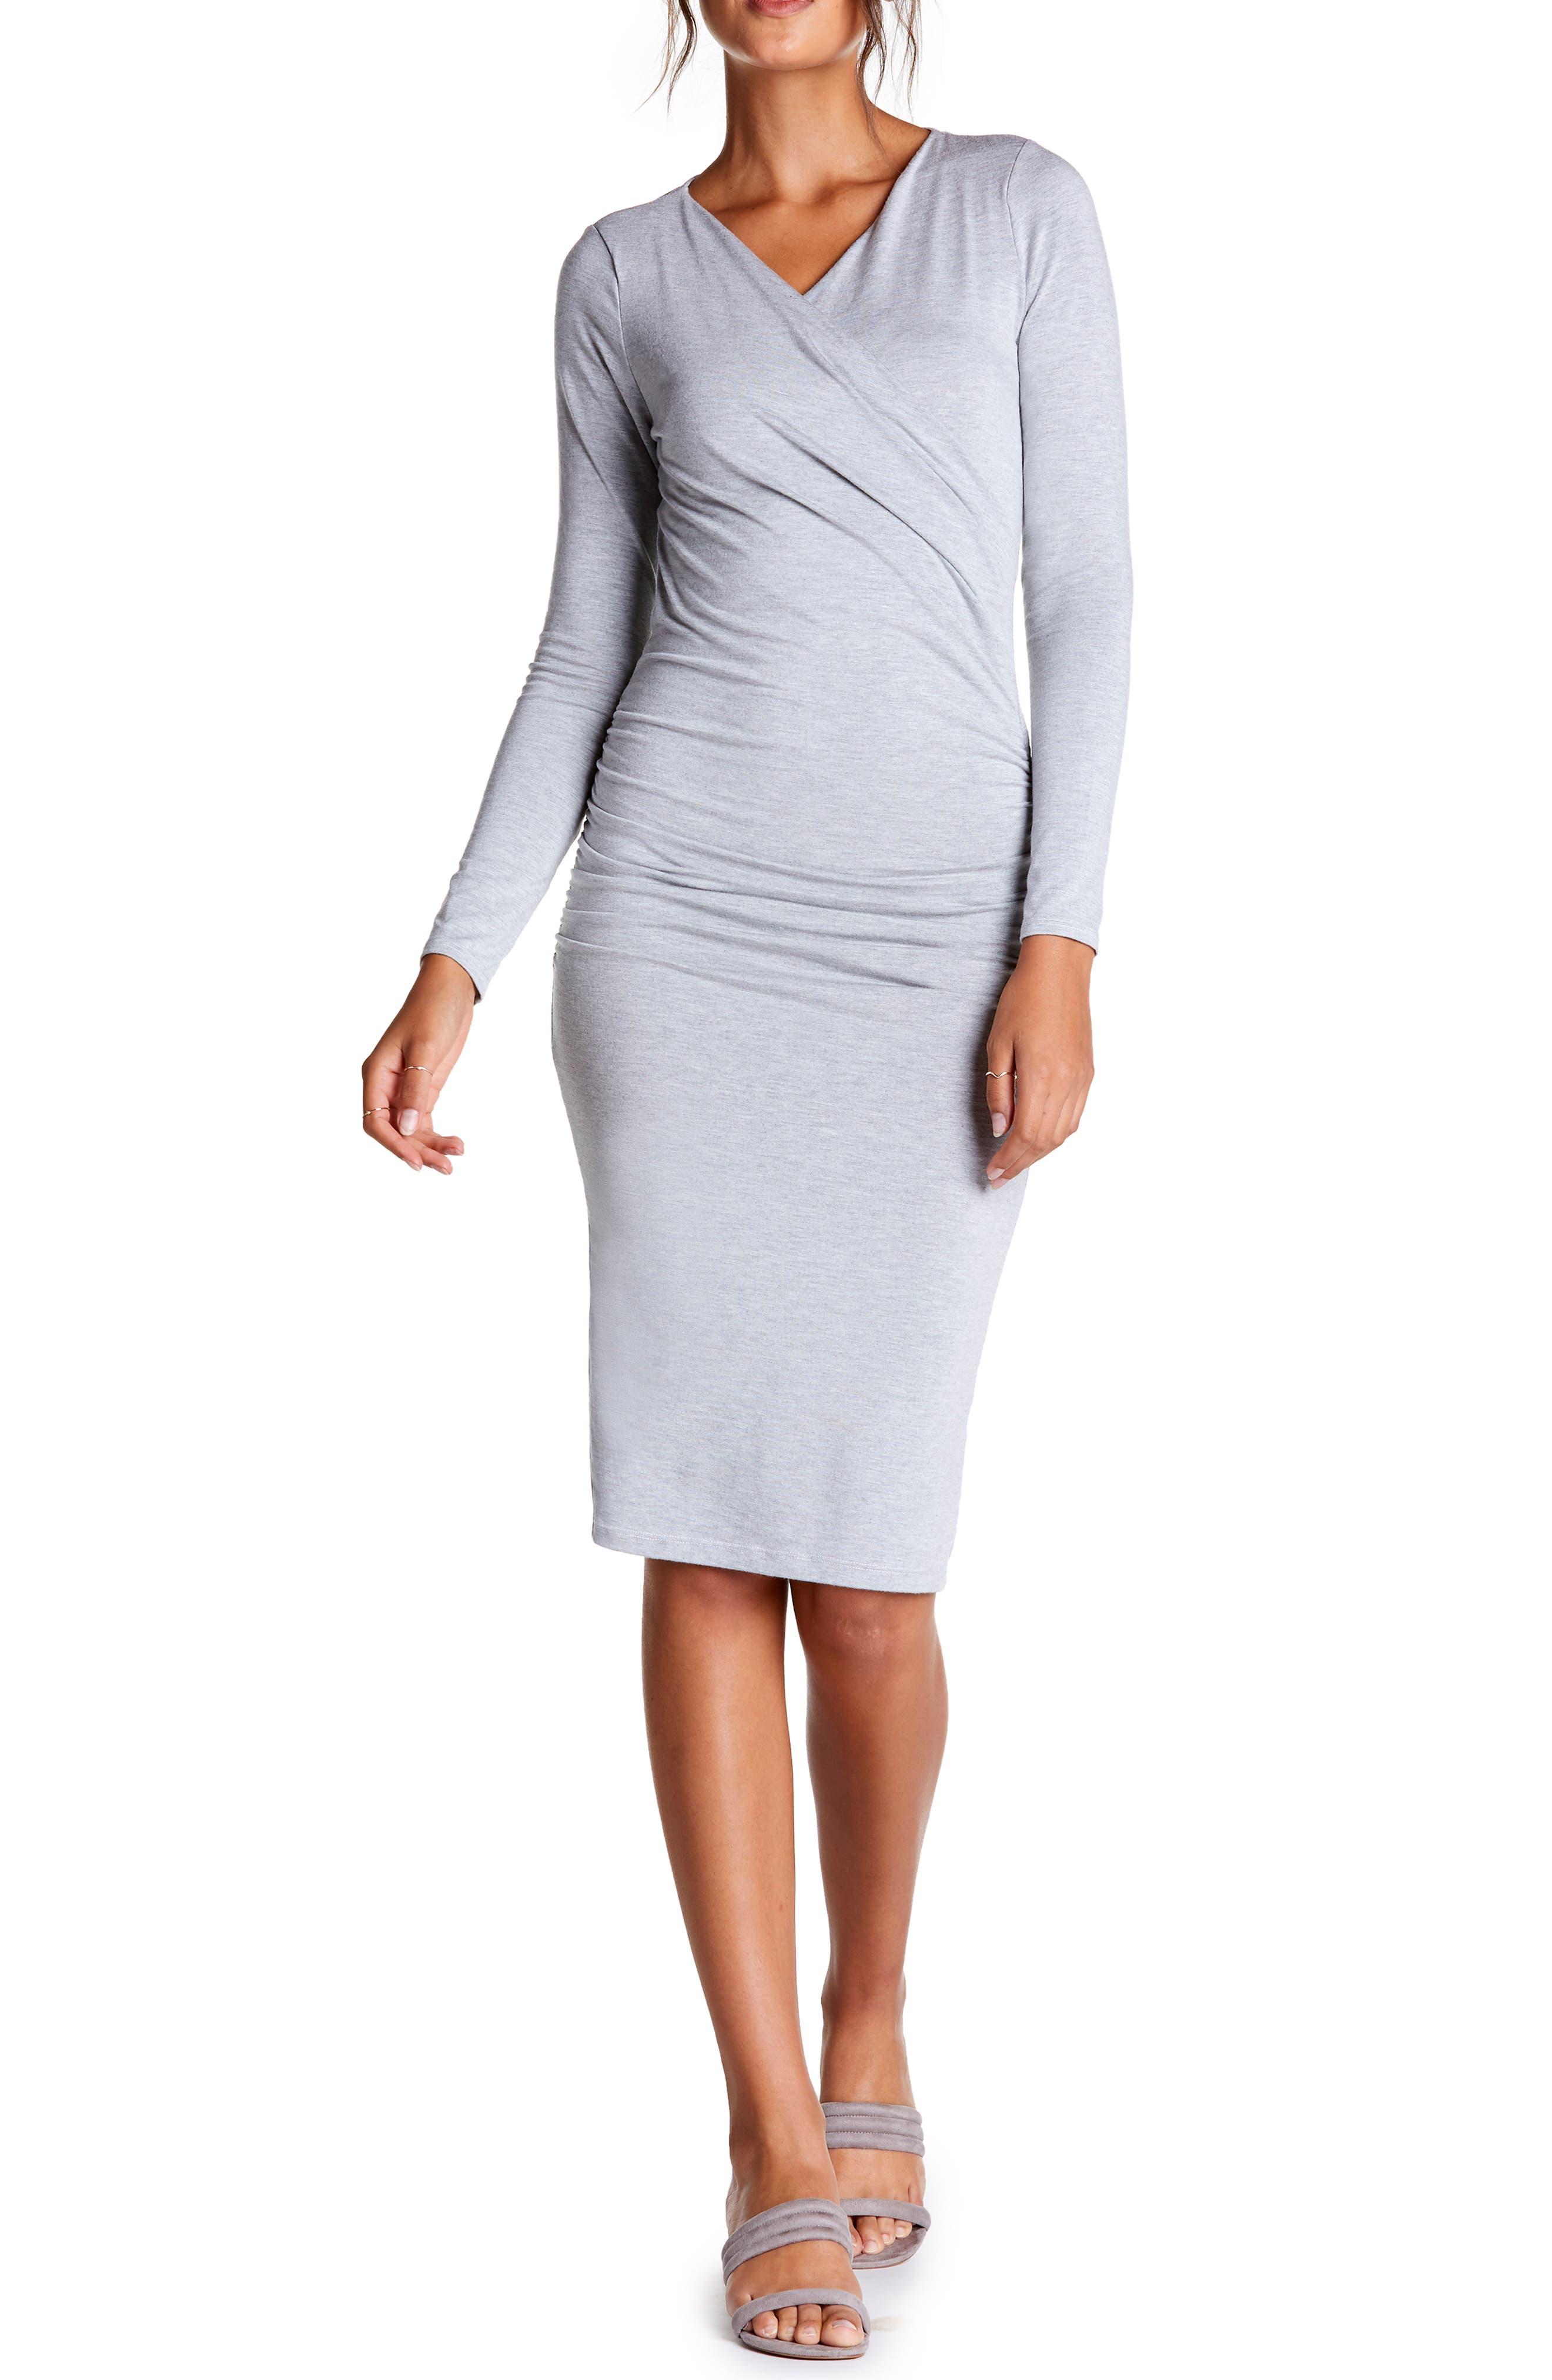 Michael Stars Mikaela Crossover Knit Dress, Grey